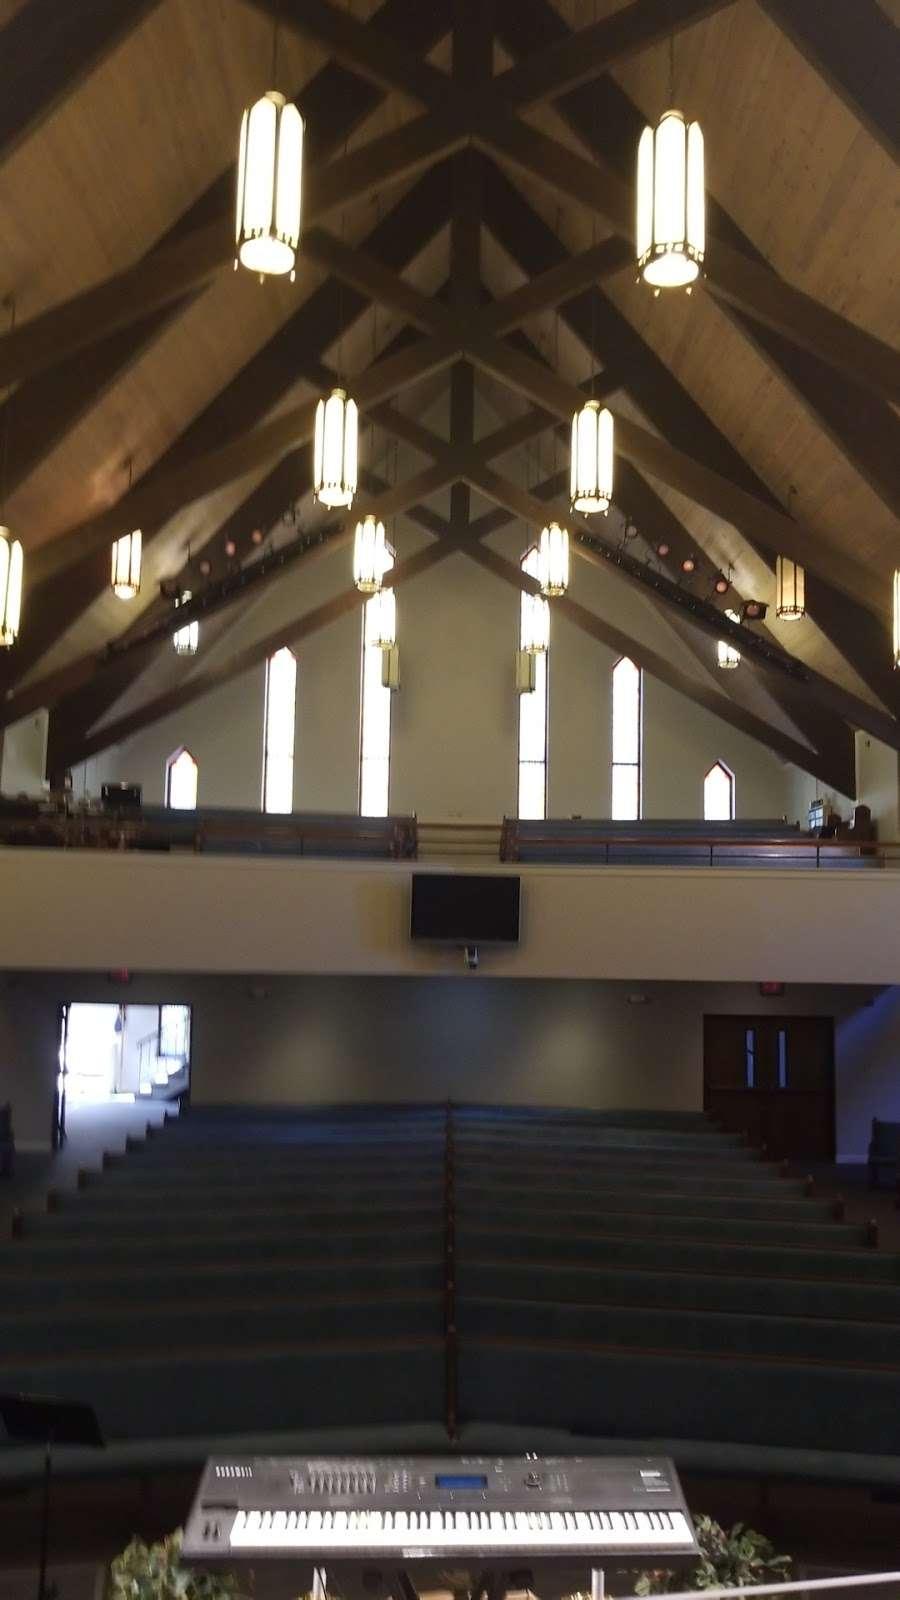 Huntersville Presbyterian Church - church  | Photo 2 of 2 | Address: 201 S Old Statesville Rd, Huntersville, NC 28078, USA | Phone: (704) 875-6892